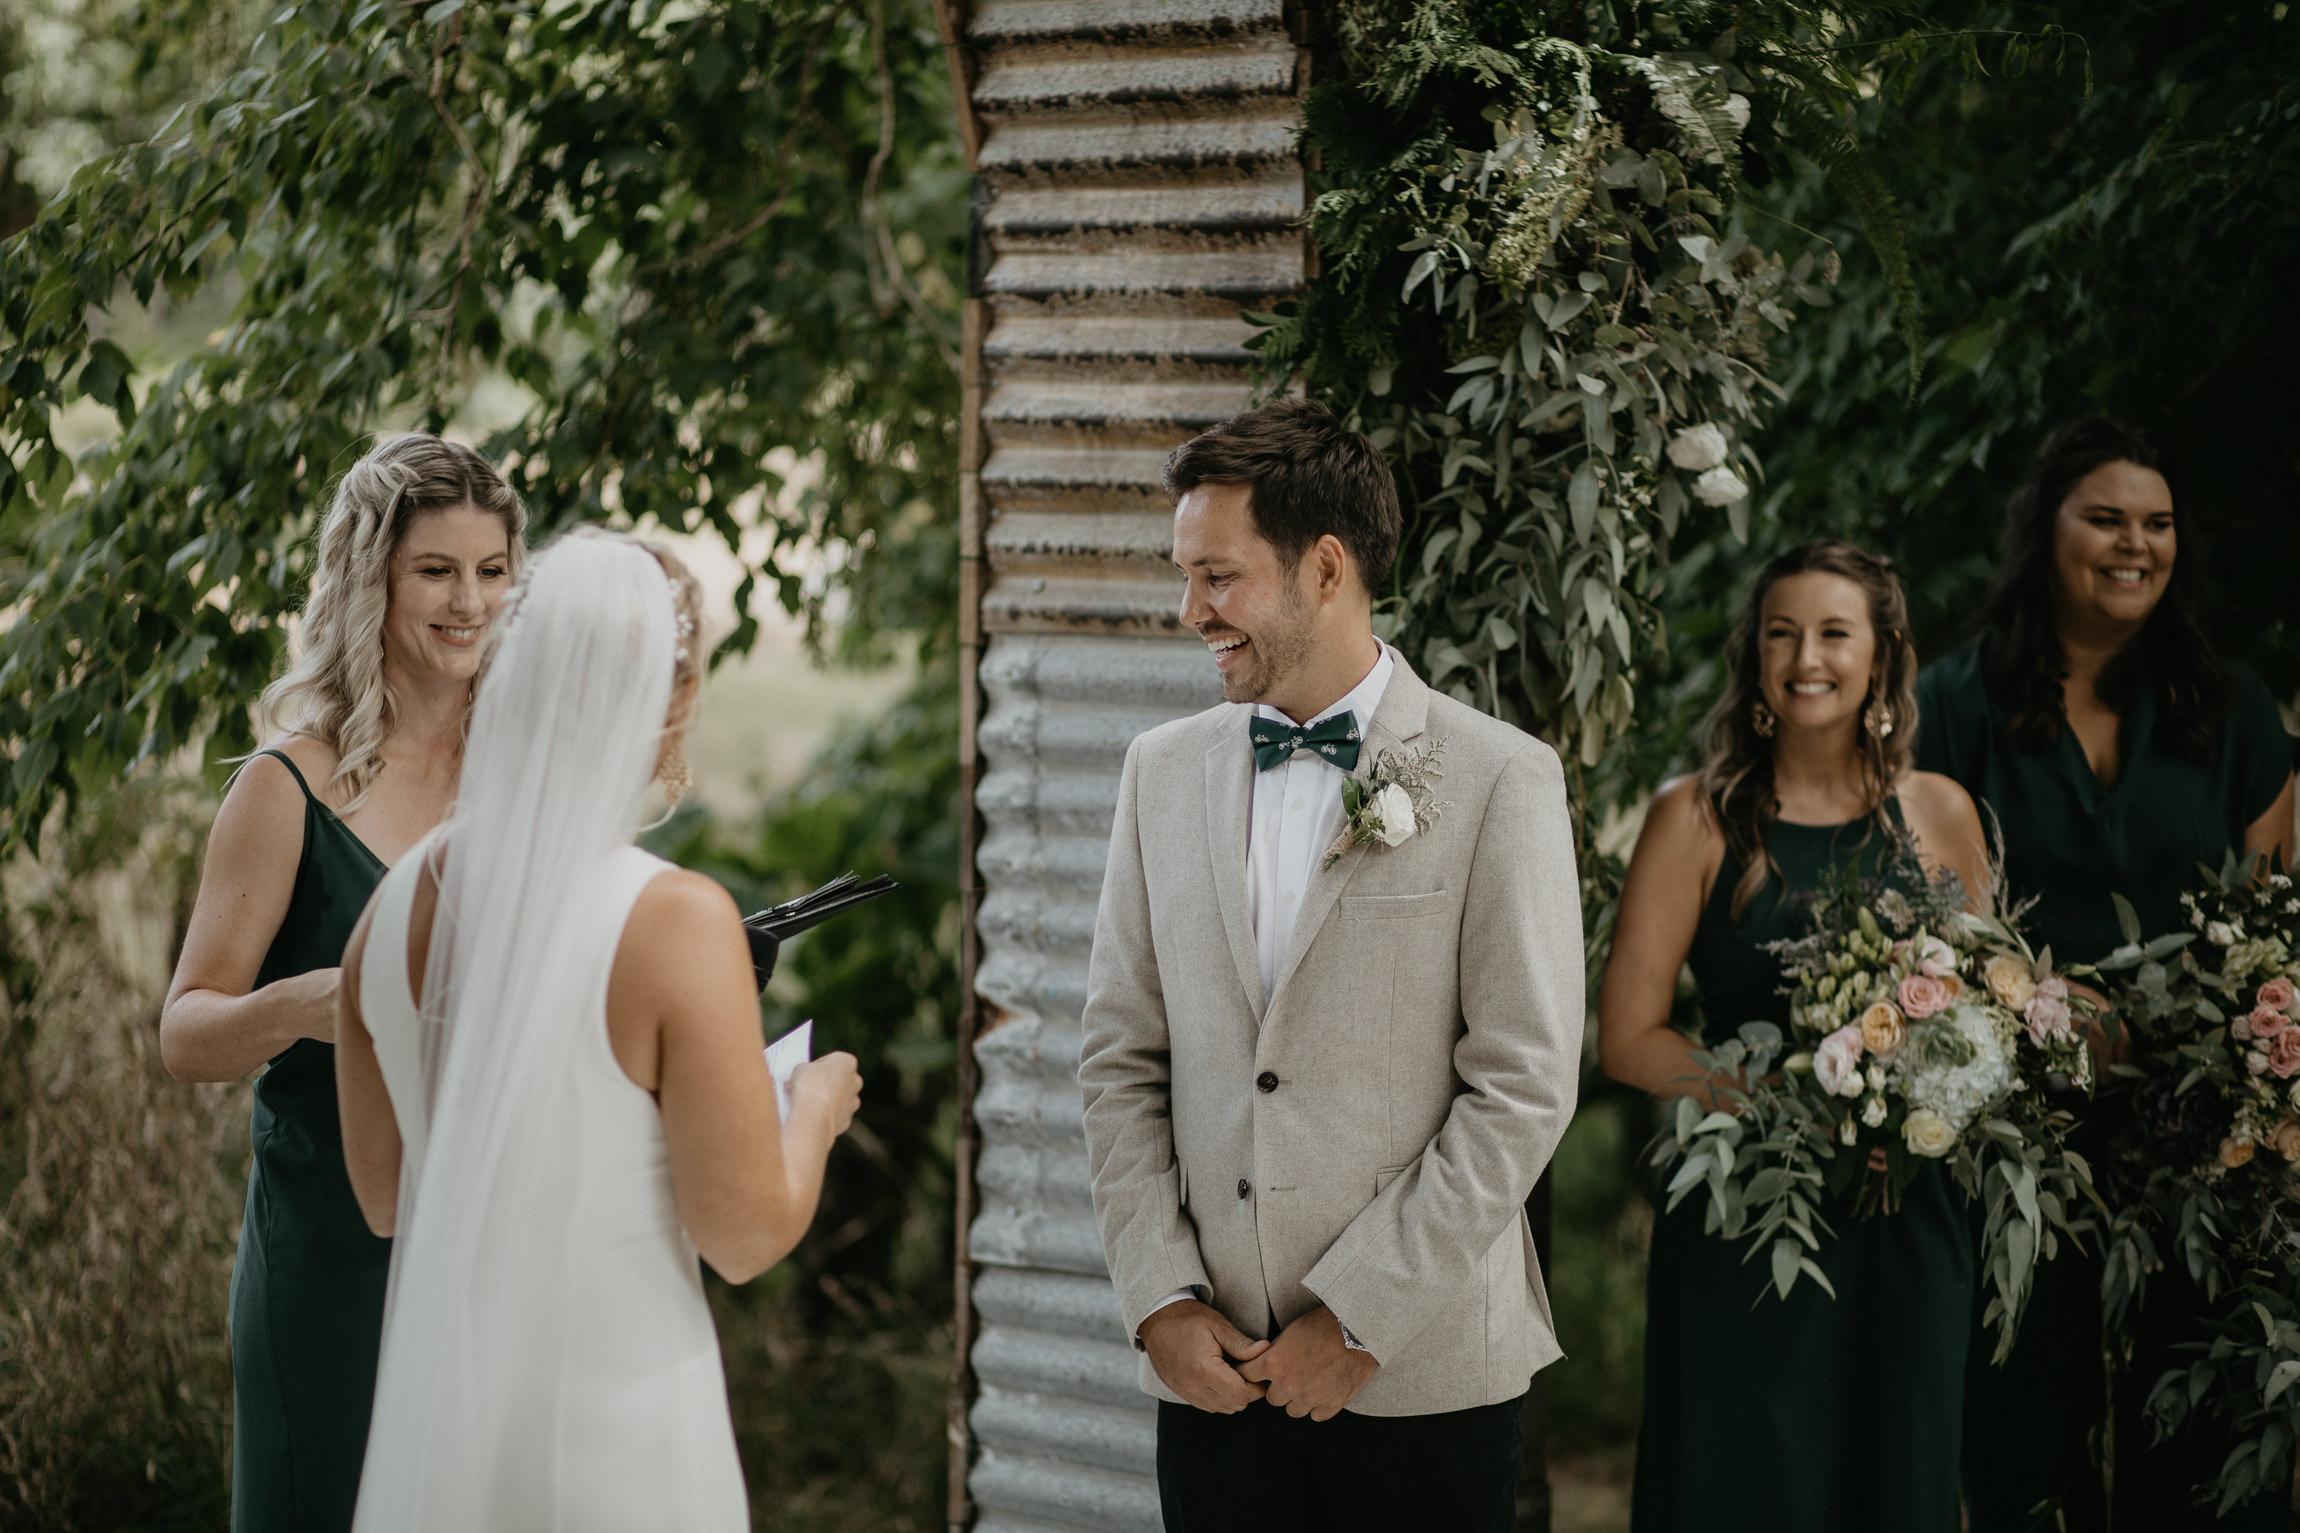 oldforestschool-wedding-blog-106.jpg